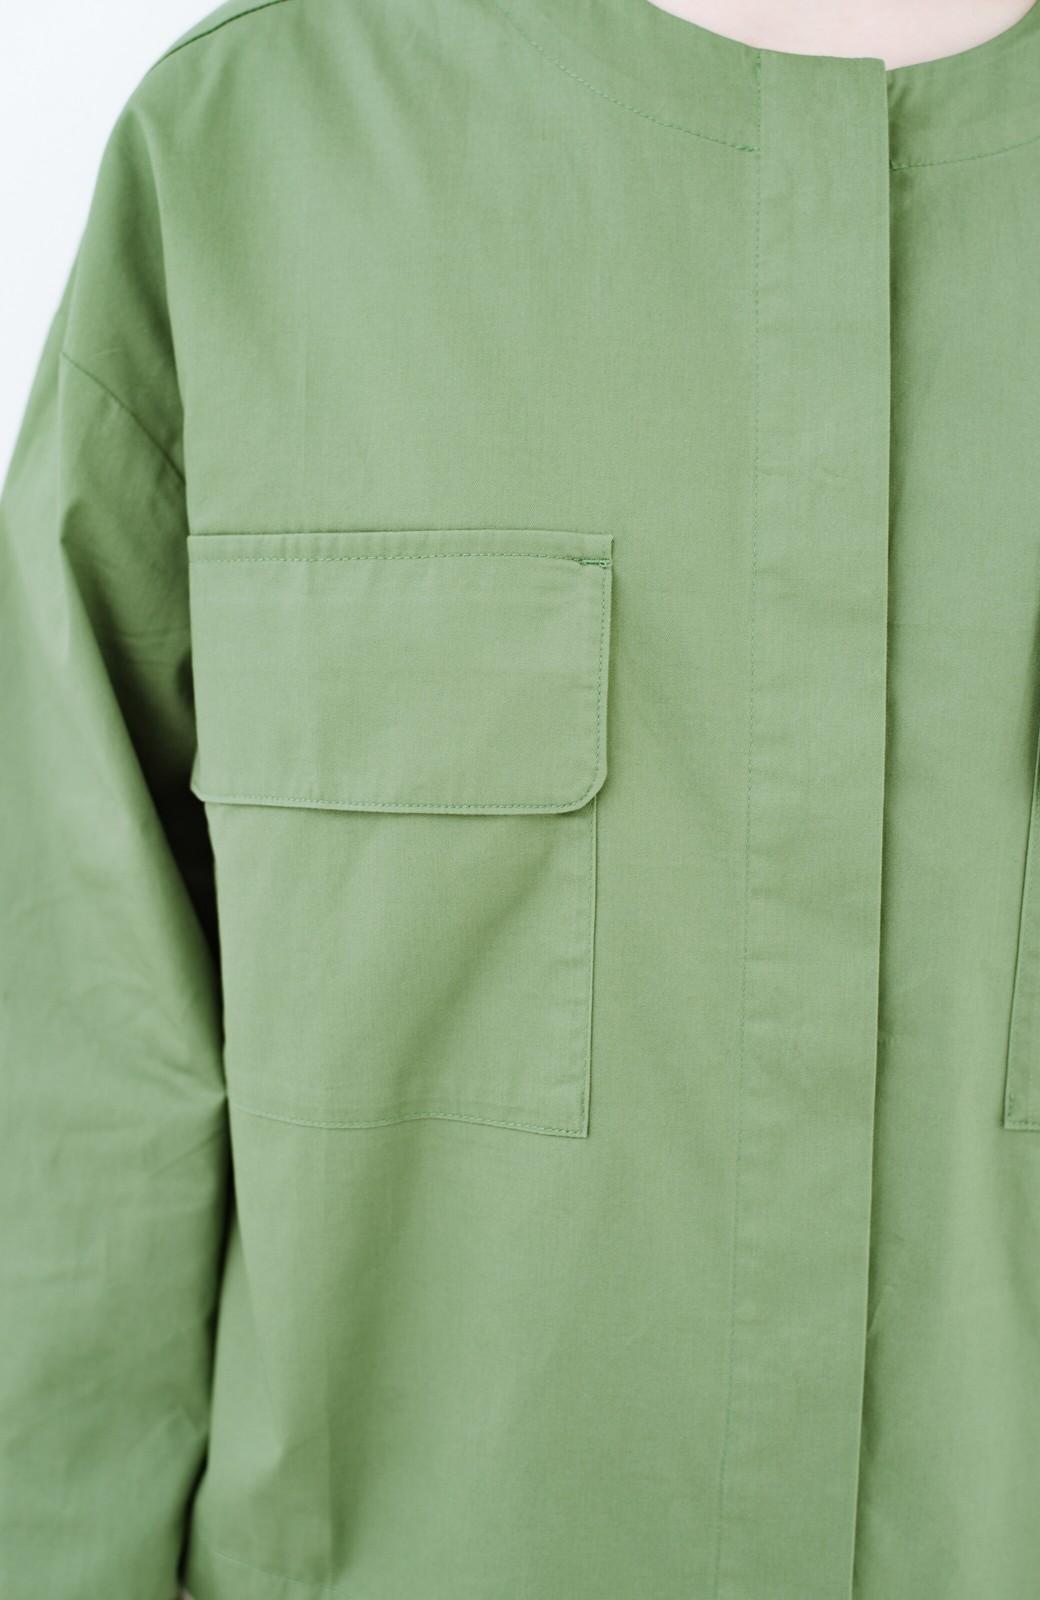 haco! さっと羽織ればコーデに味付け 軽さが自慢のノーカラーミリタリージャケット <カーキ>の商品写真3